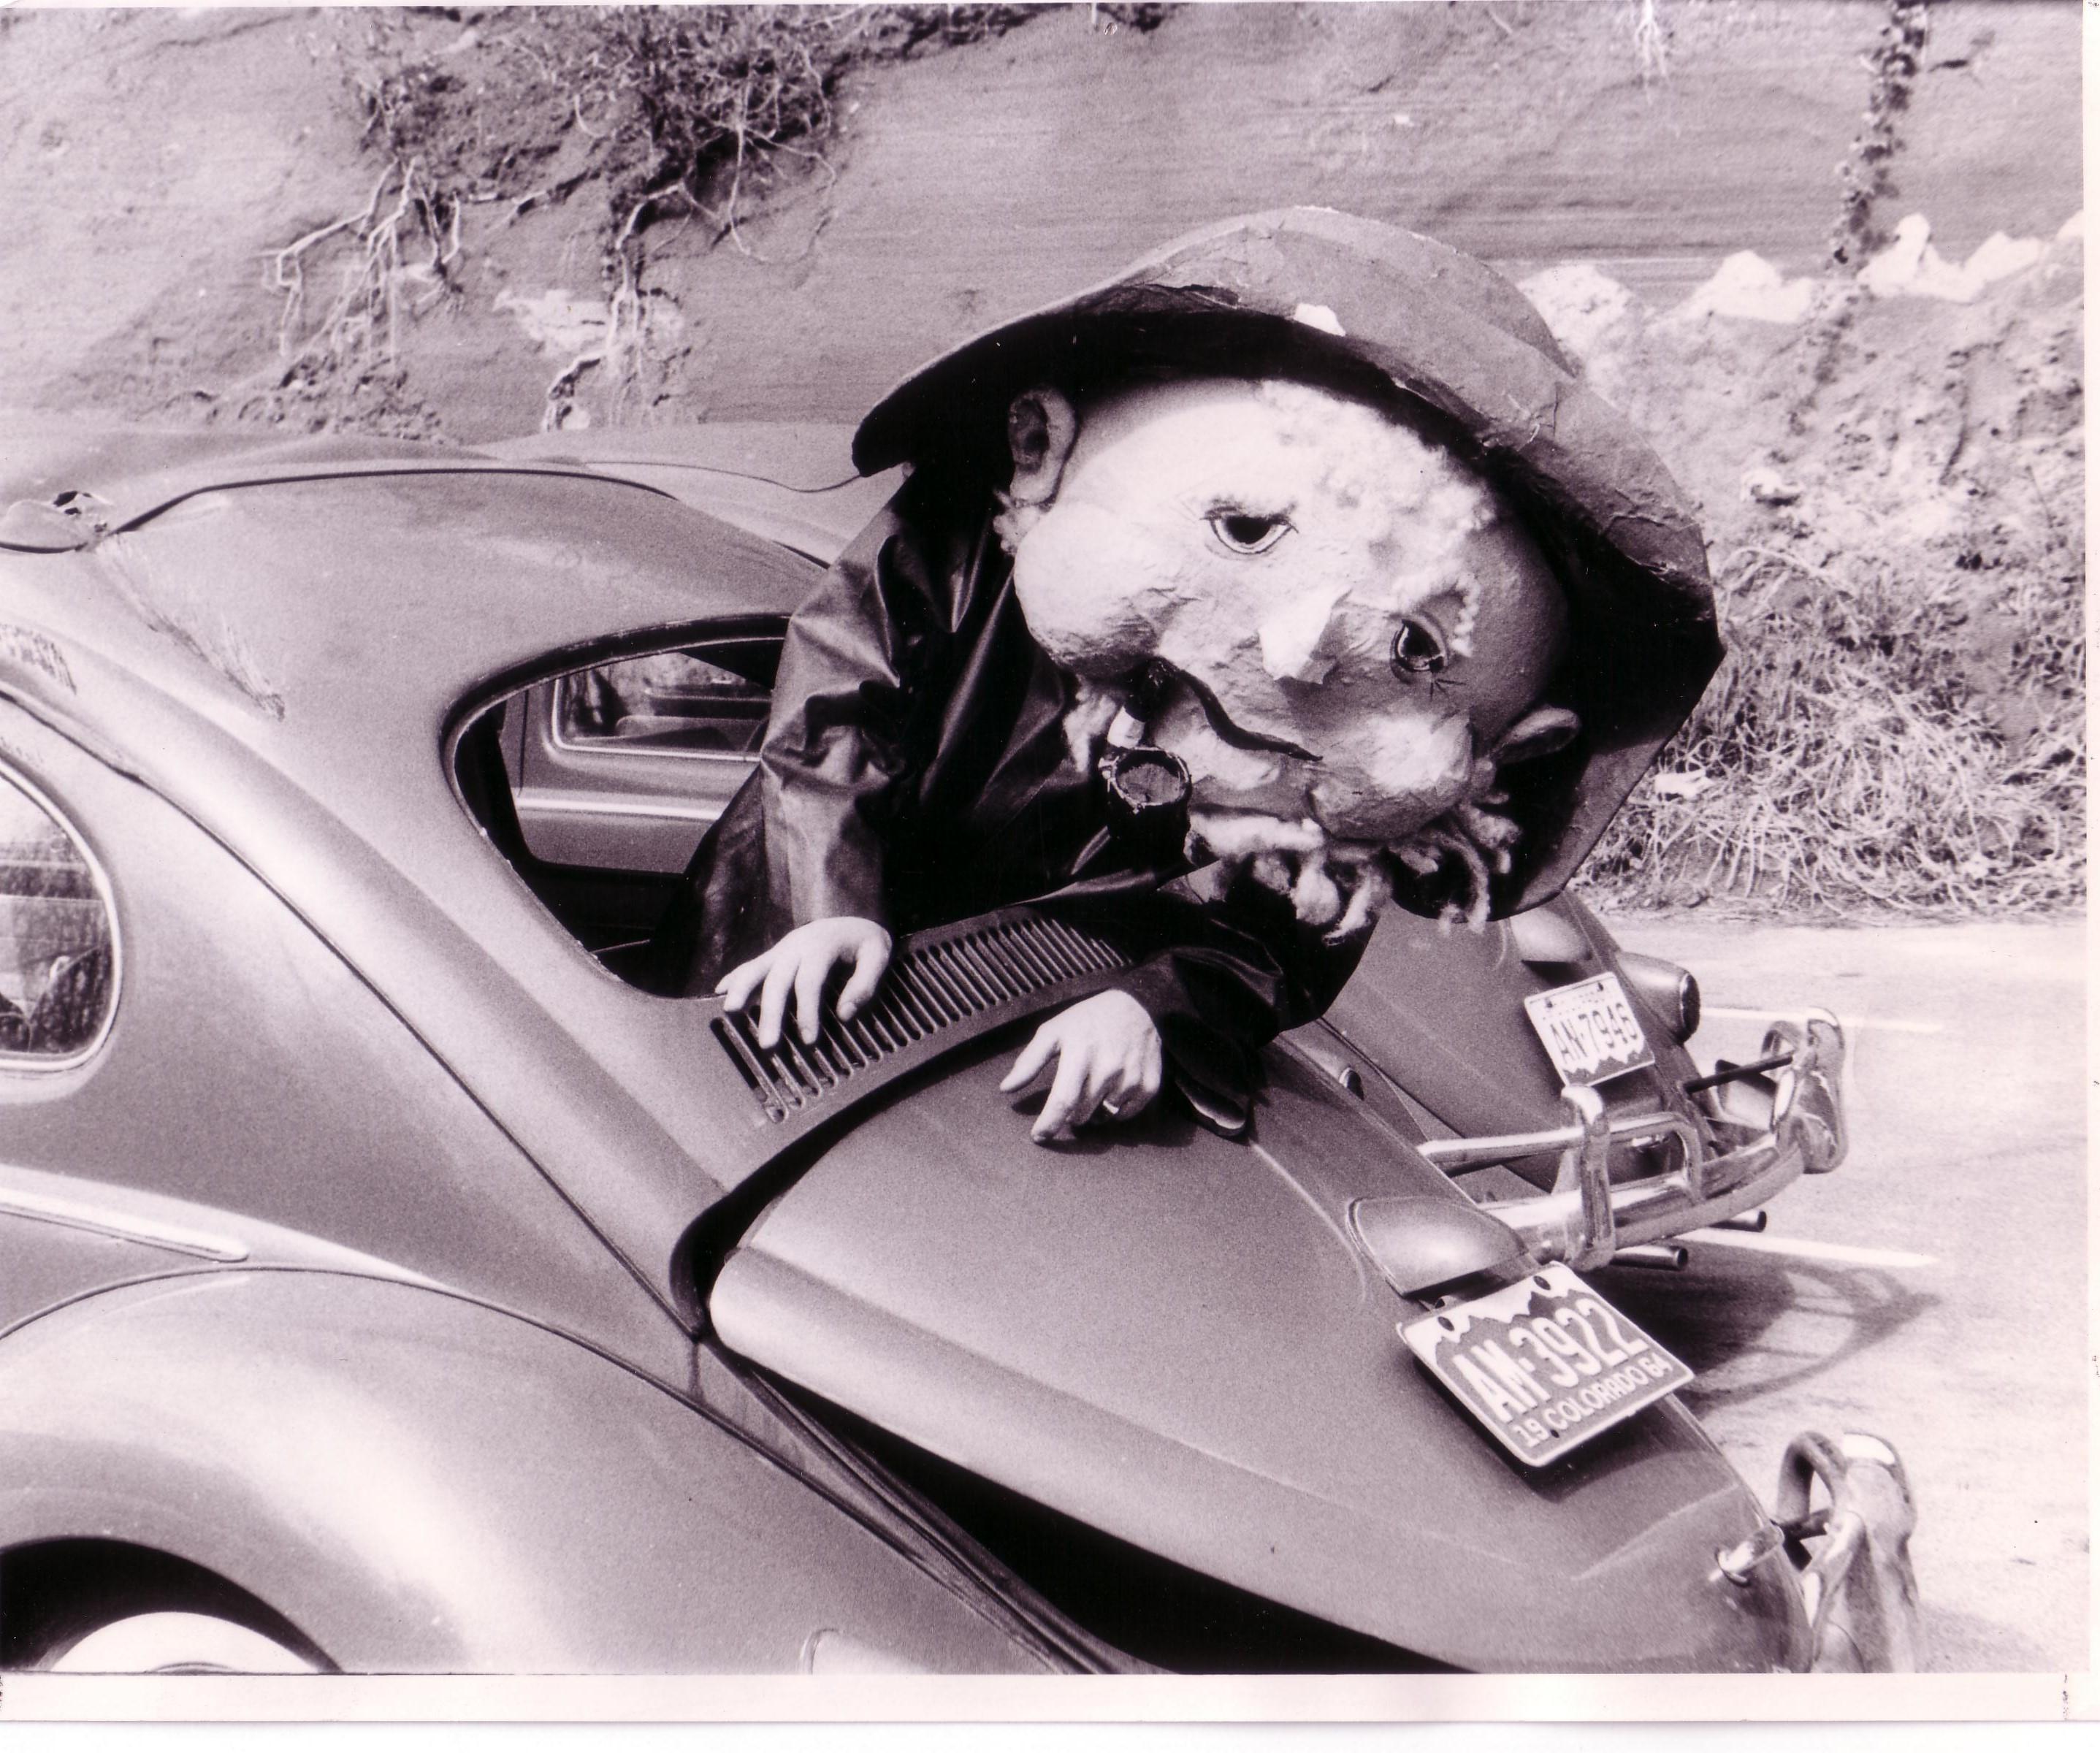 Wally Pilot, 1965